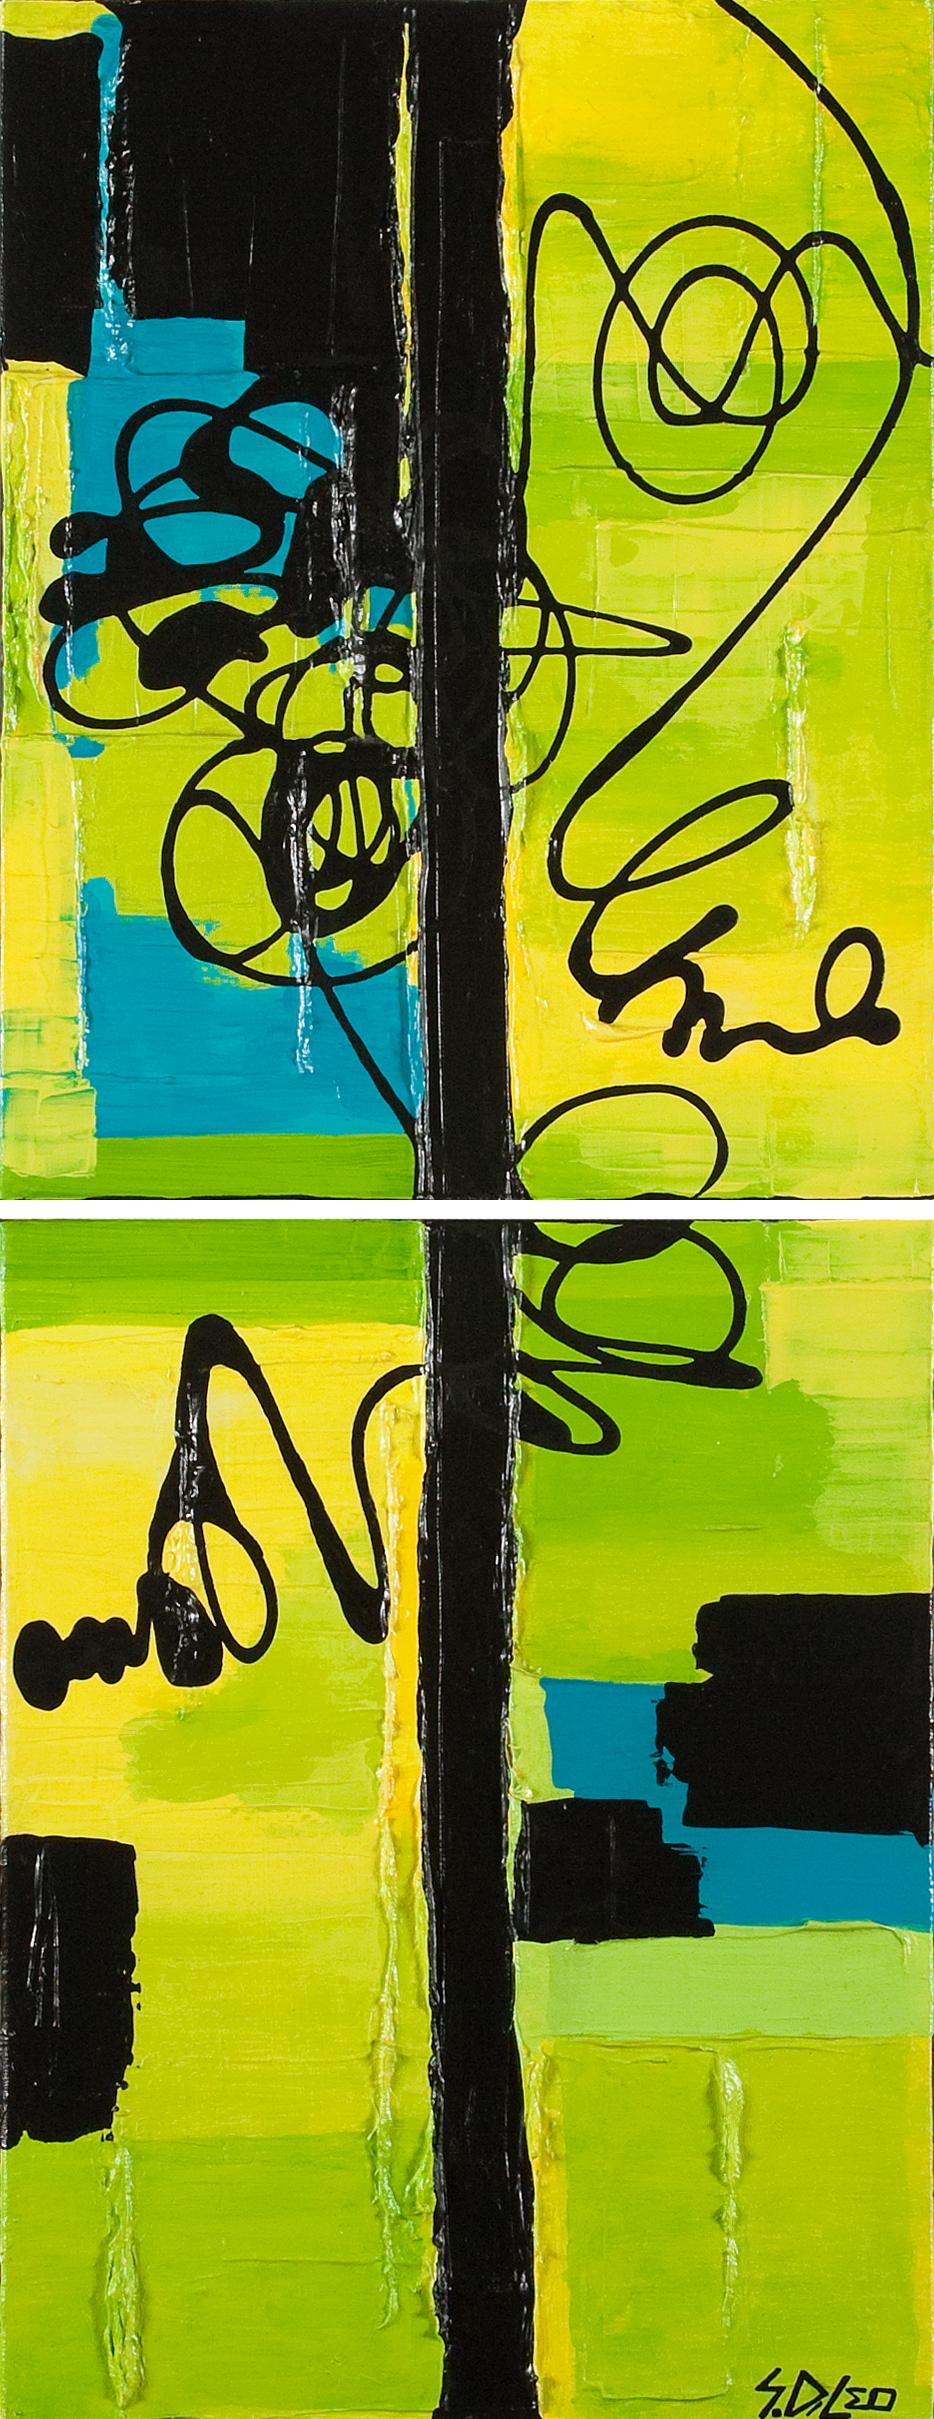 "vert 14"" x 36"" acrylic on canvas SOLD"